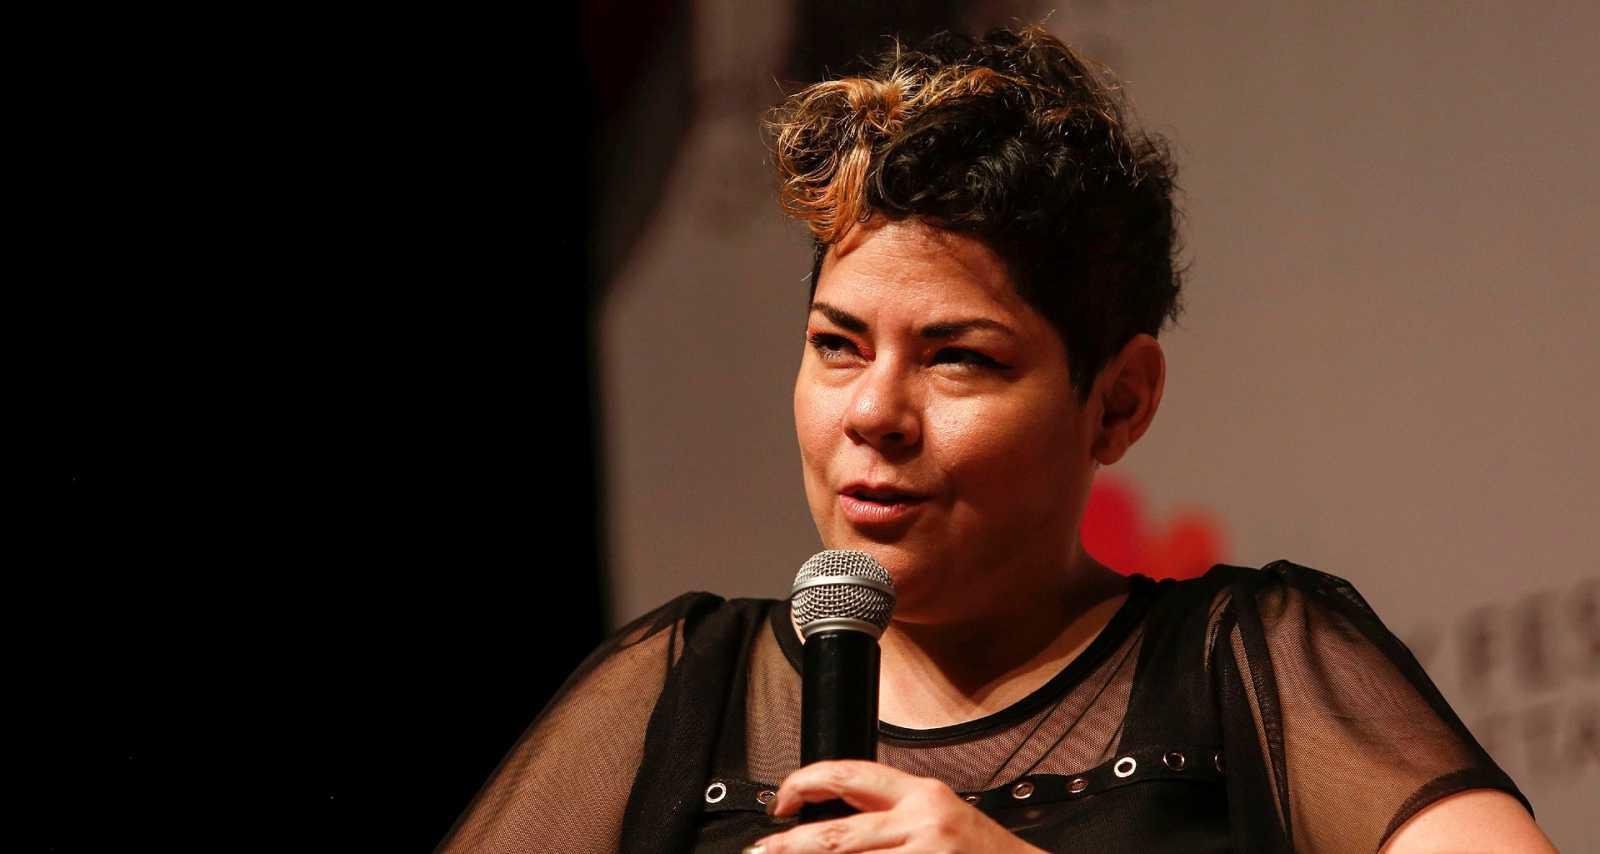 Hora América en Radio 5 - 'Sacrificios humanos', de María Fernanda Ampuero - 23/03/21 - Escuchar ahora